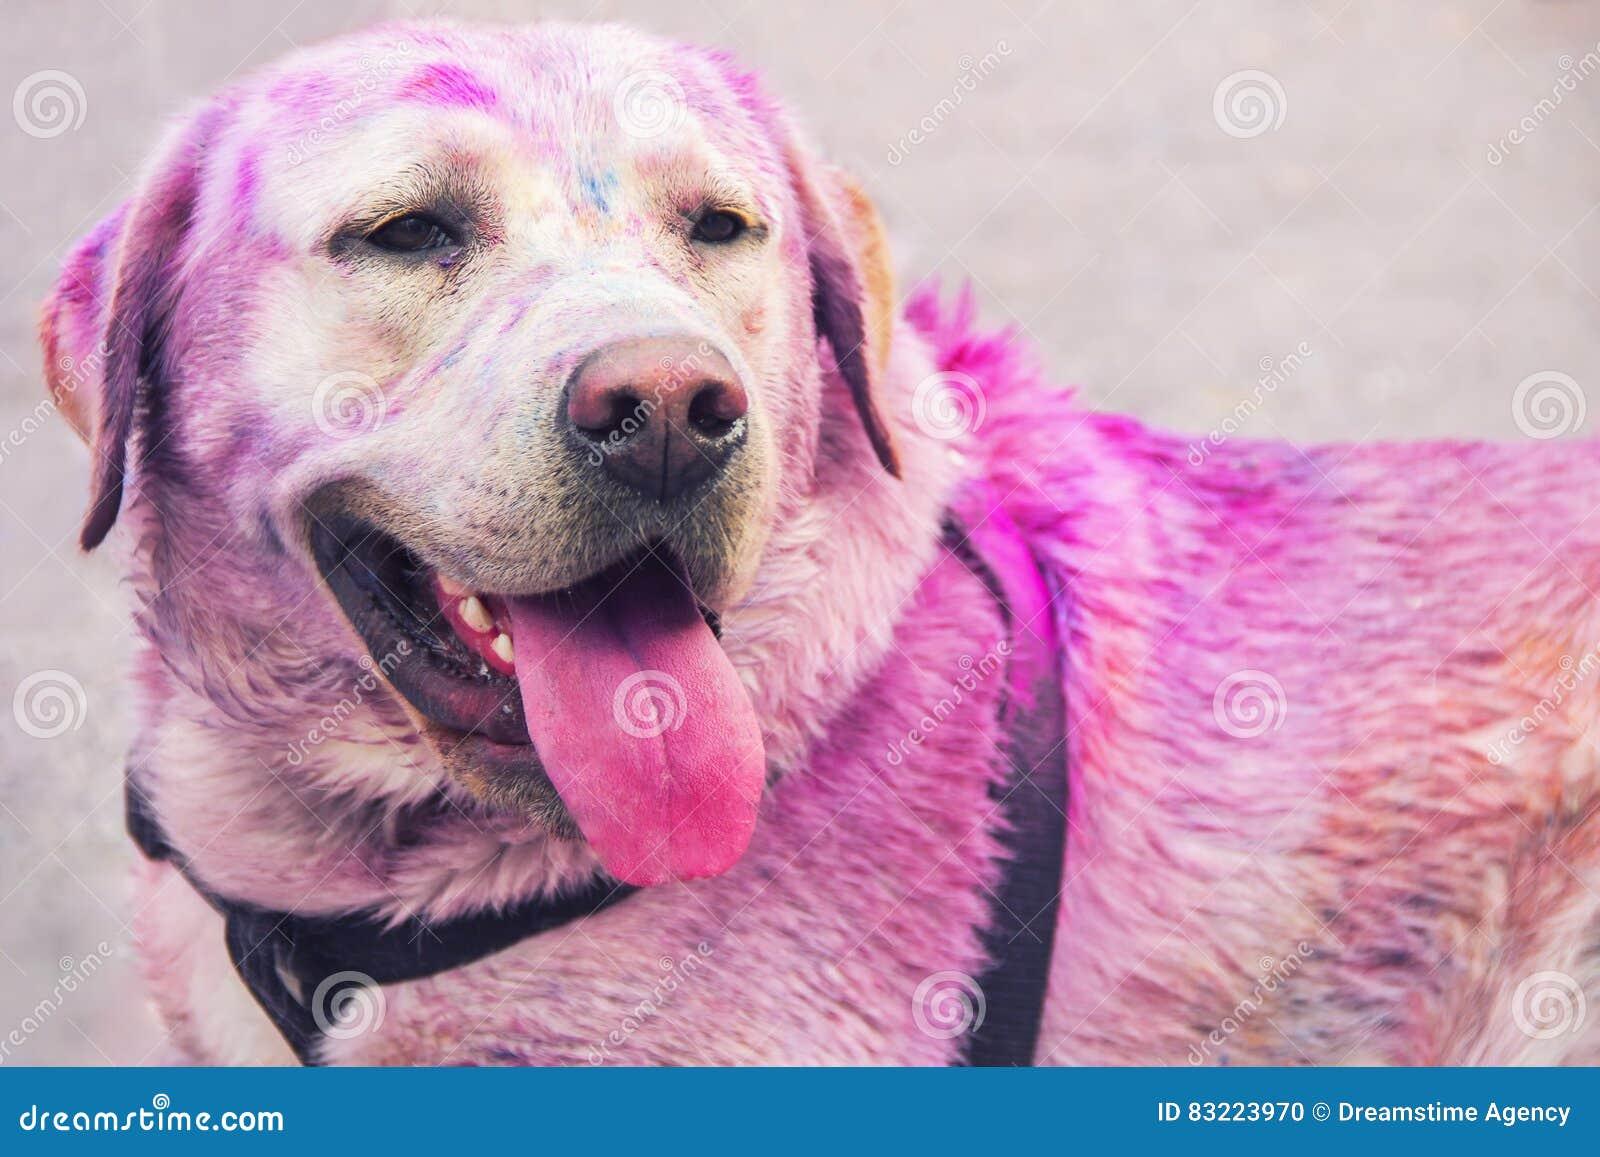 Friendly Labrador.